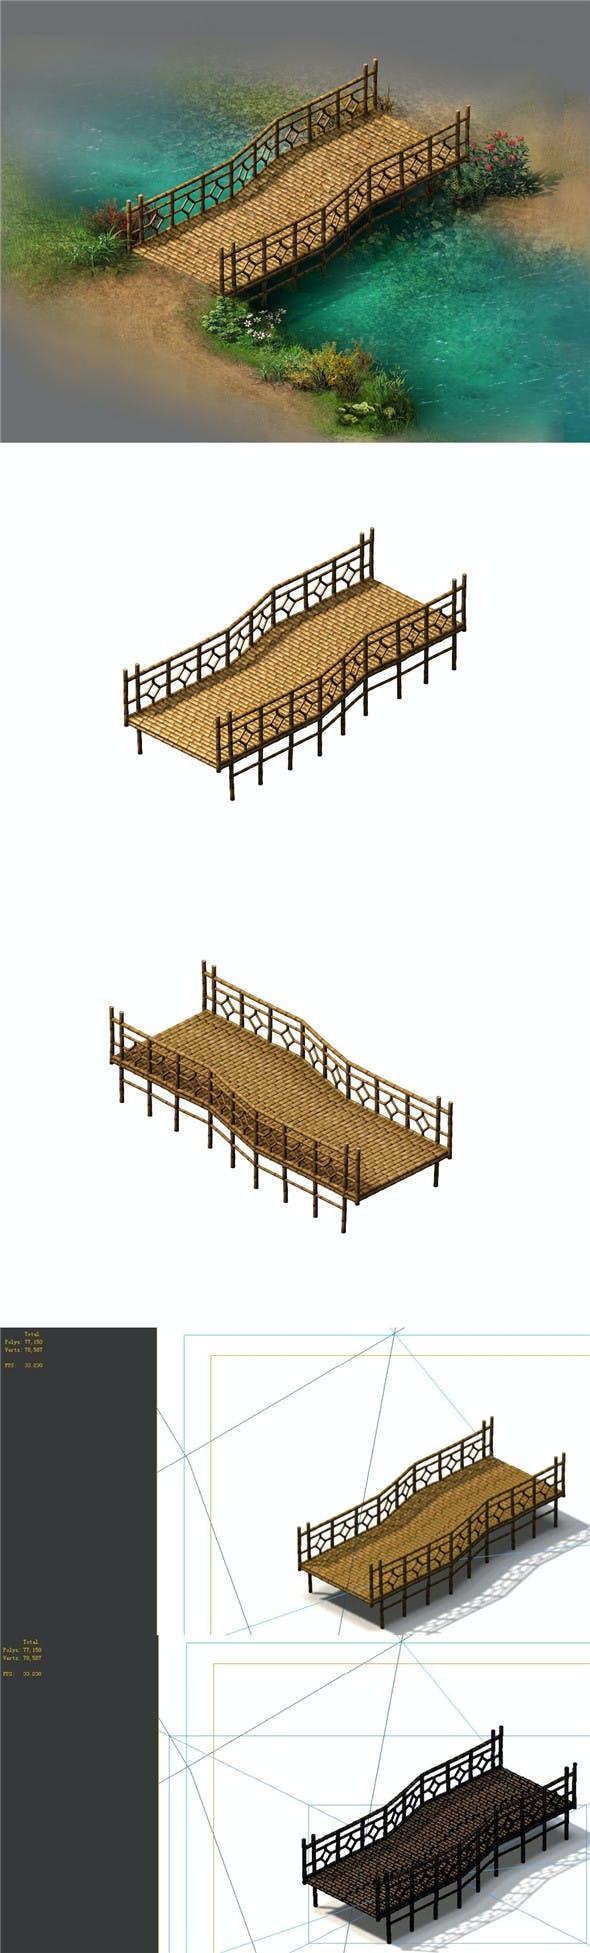 Field - Bamboo Bridge - 3DOcean Item for Sale